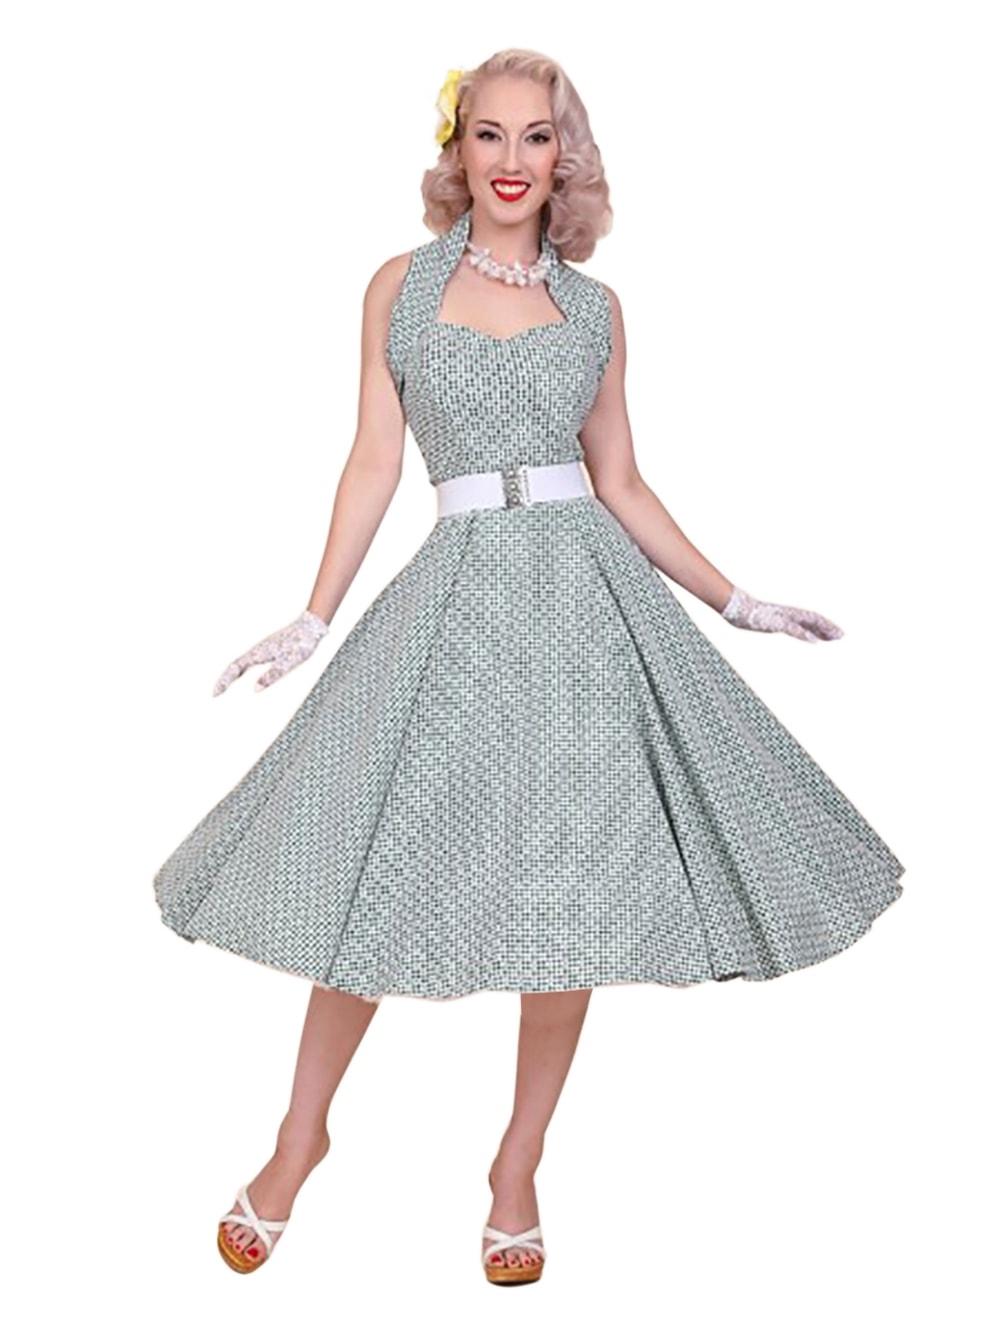 3fefd0de3 1950s Halterneck Daisy Gingham Bottle Dress from Vivien of Holloway